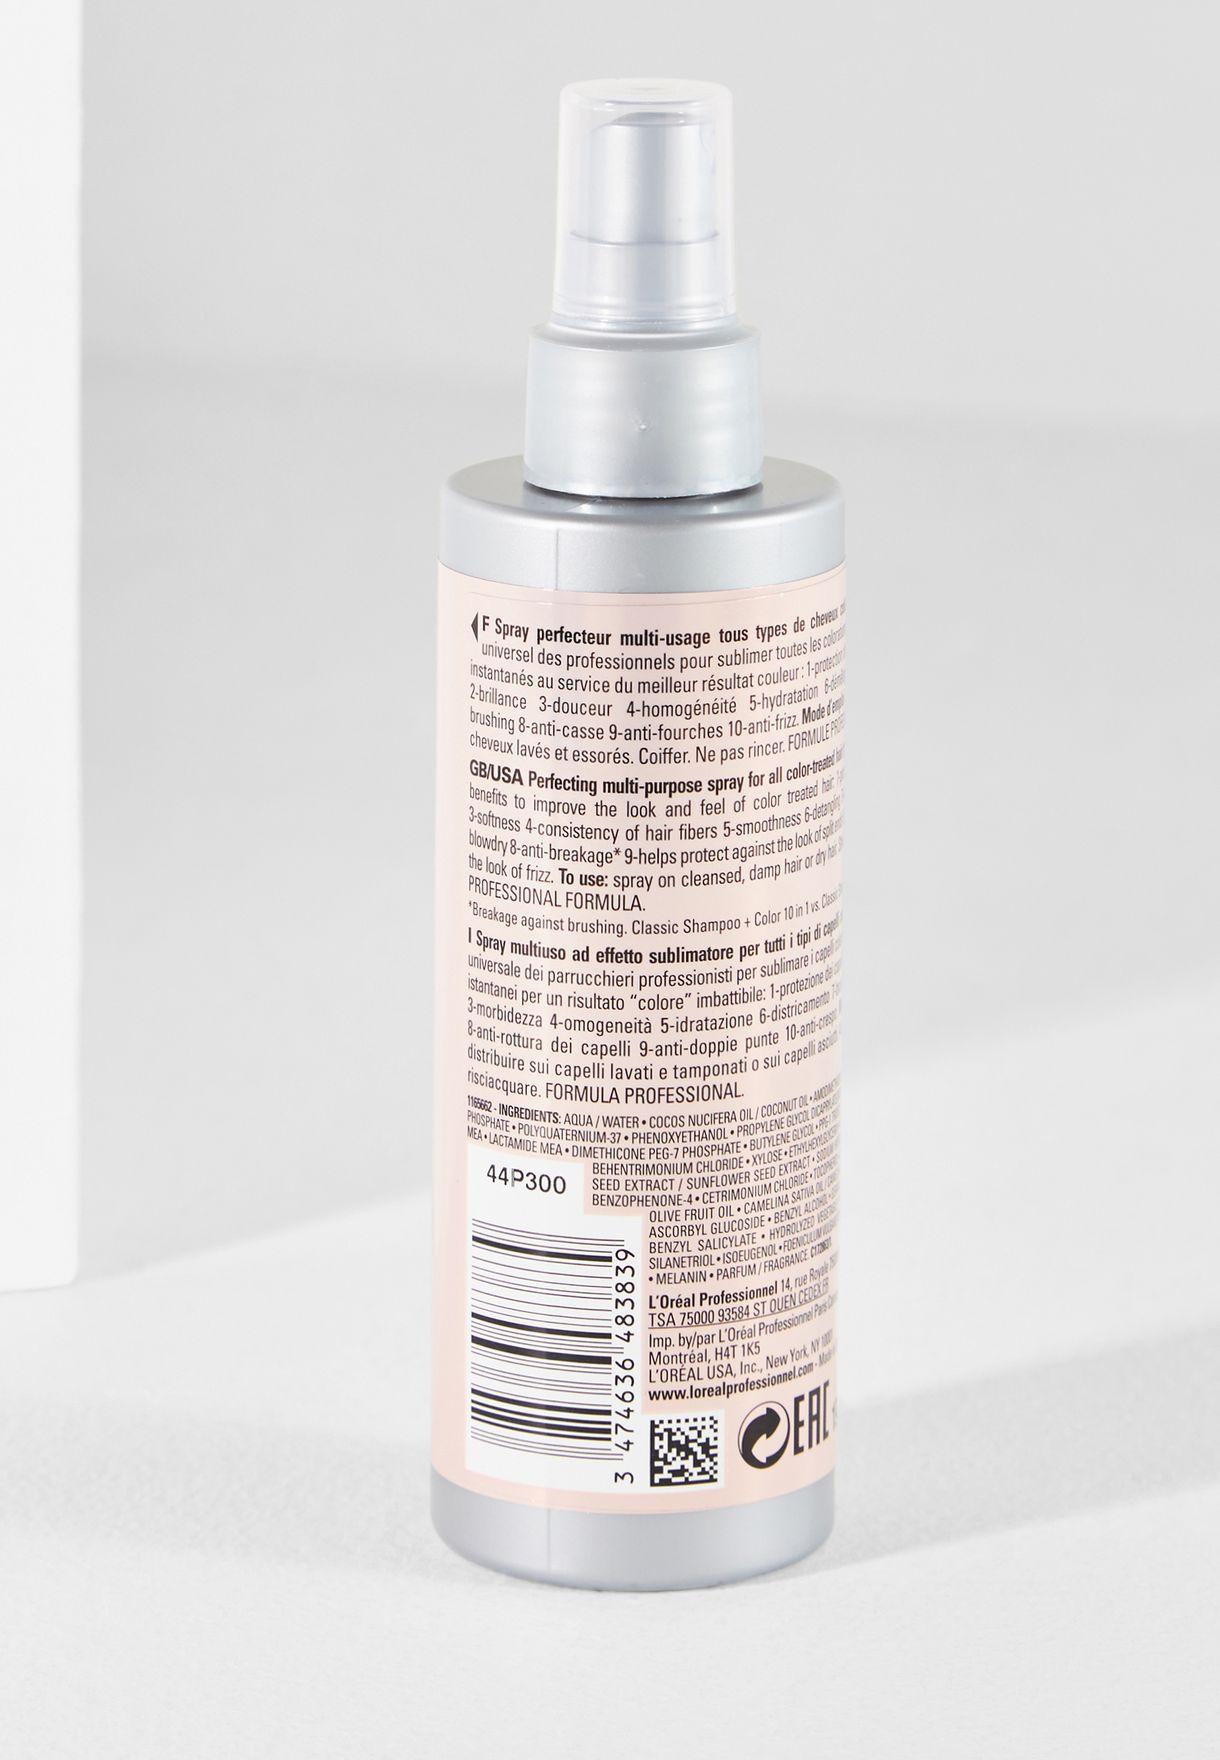 Serie Expert - Perfecting Multipurpose Spray